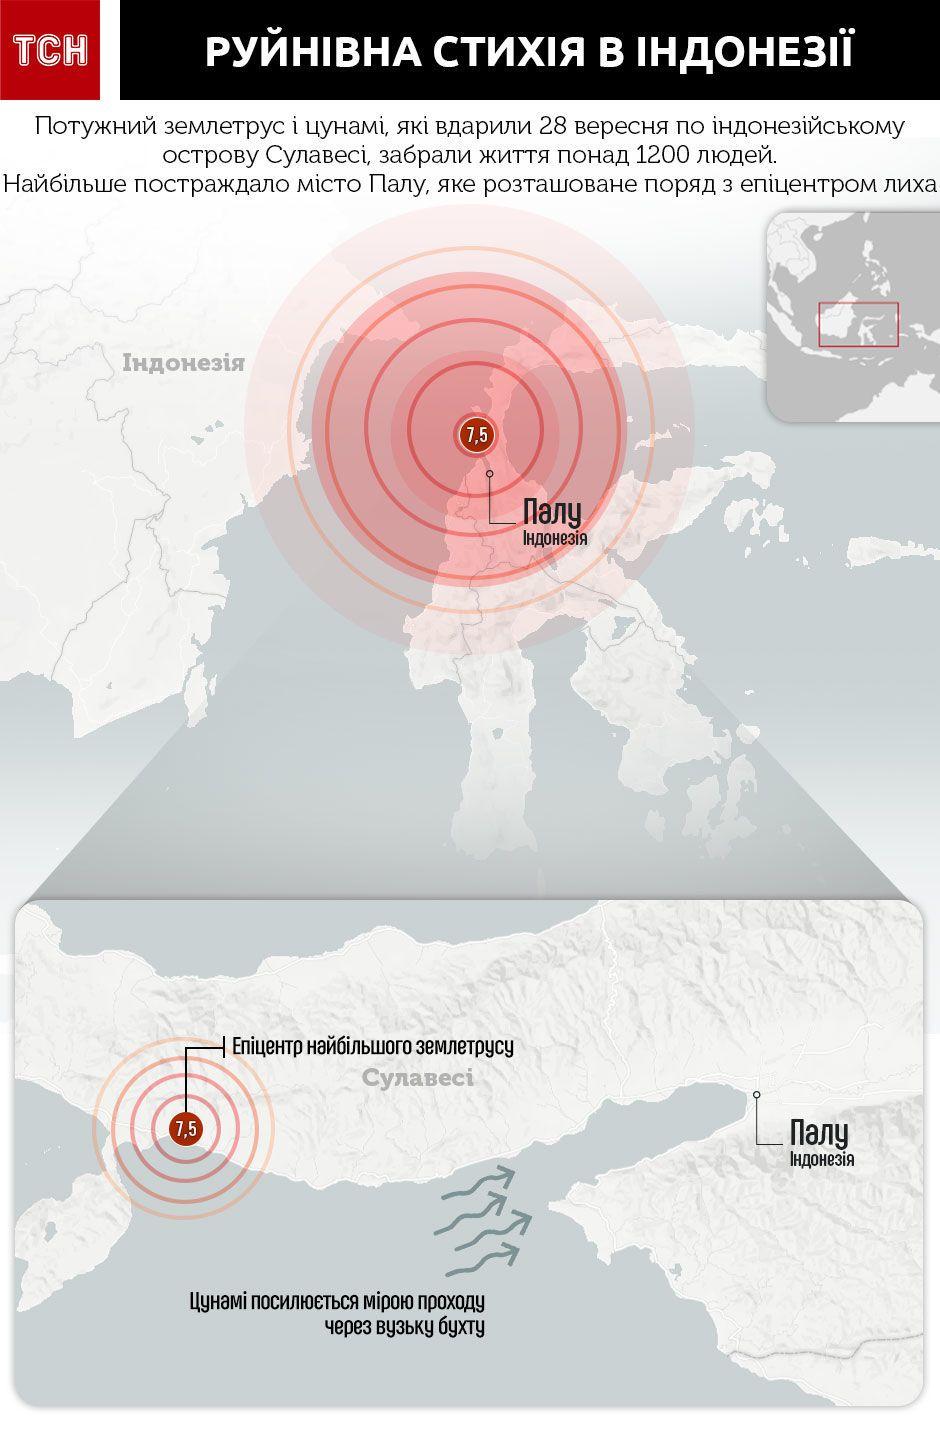 землетрус в Індонезії, Палу, інфографіка